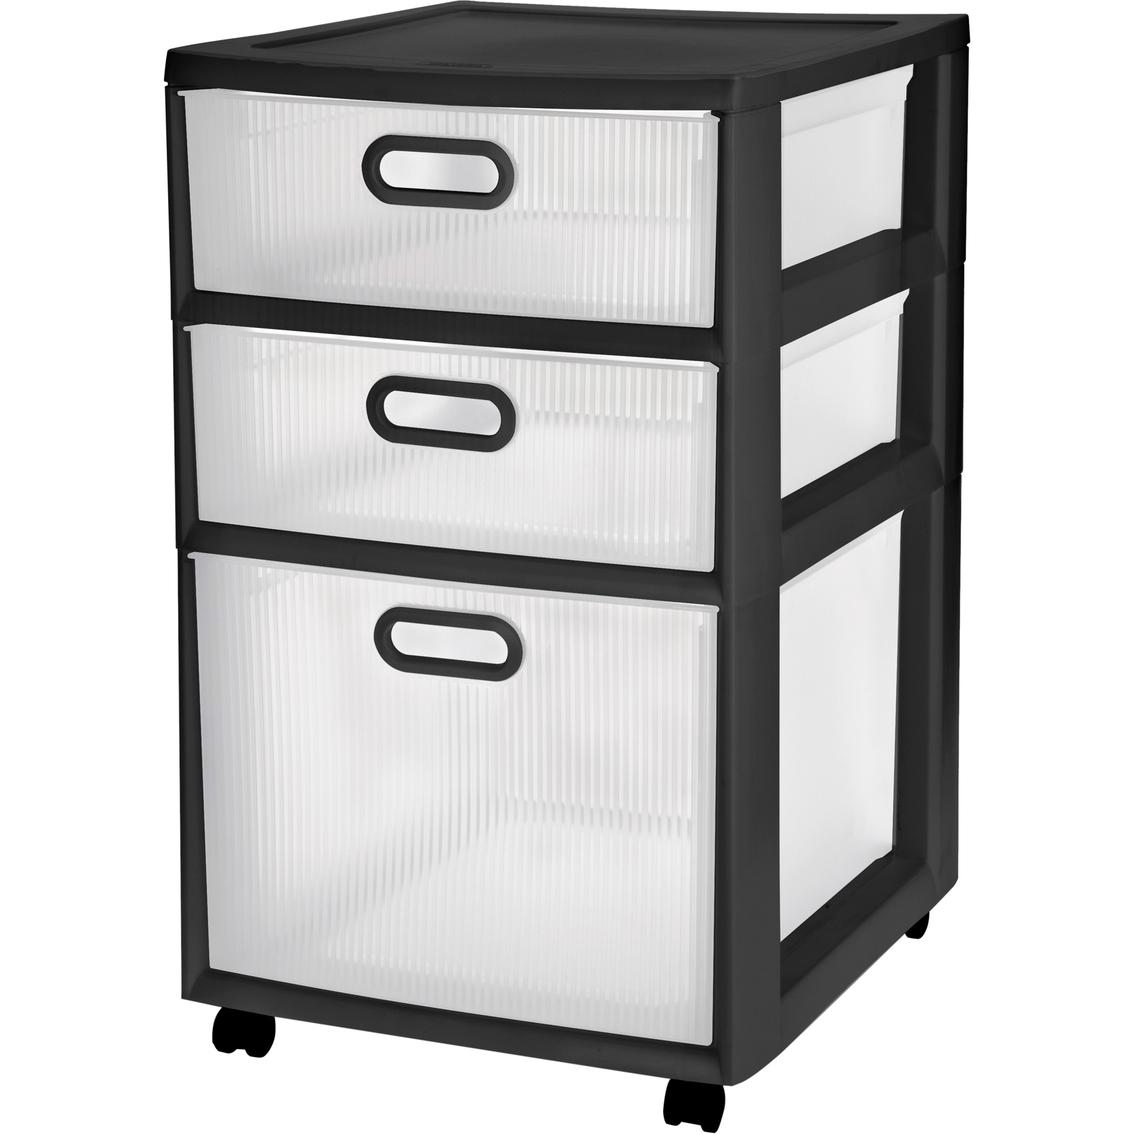 Sterilite 3 Drawer Ultra Cart Closet Organization Household Shop The Exchange